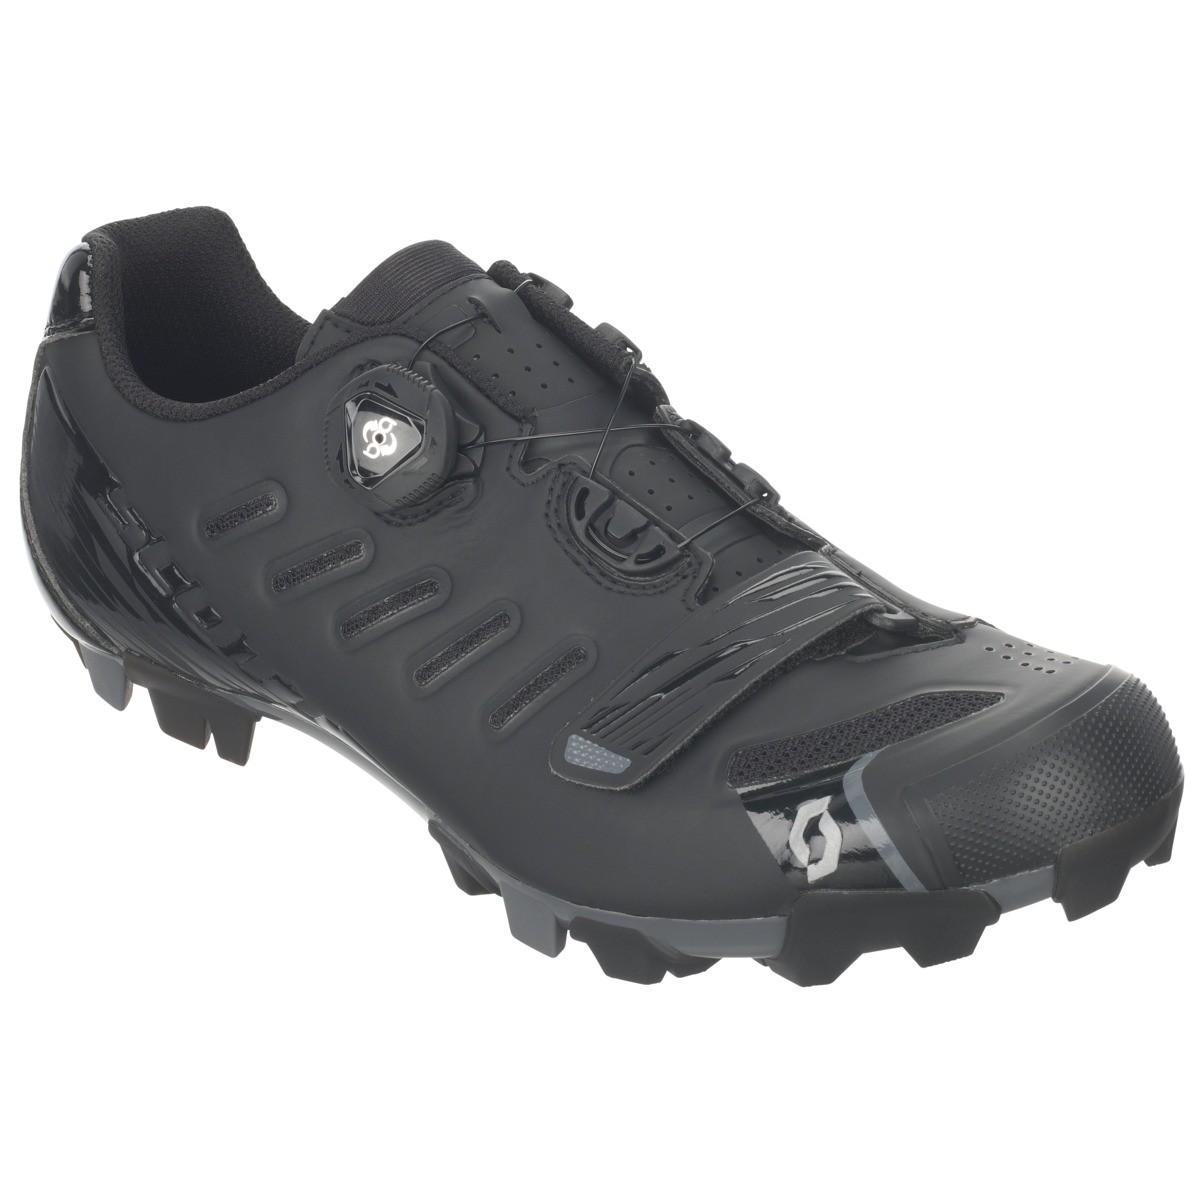 Nowe buty SPD SCOTT MTB TEAM BOA r43 m2018 -30%